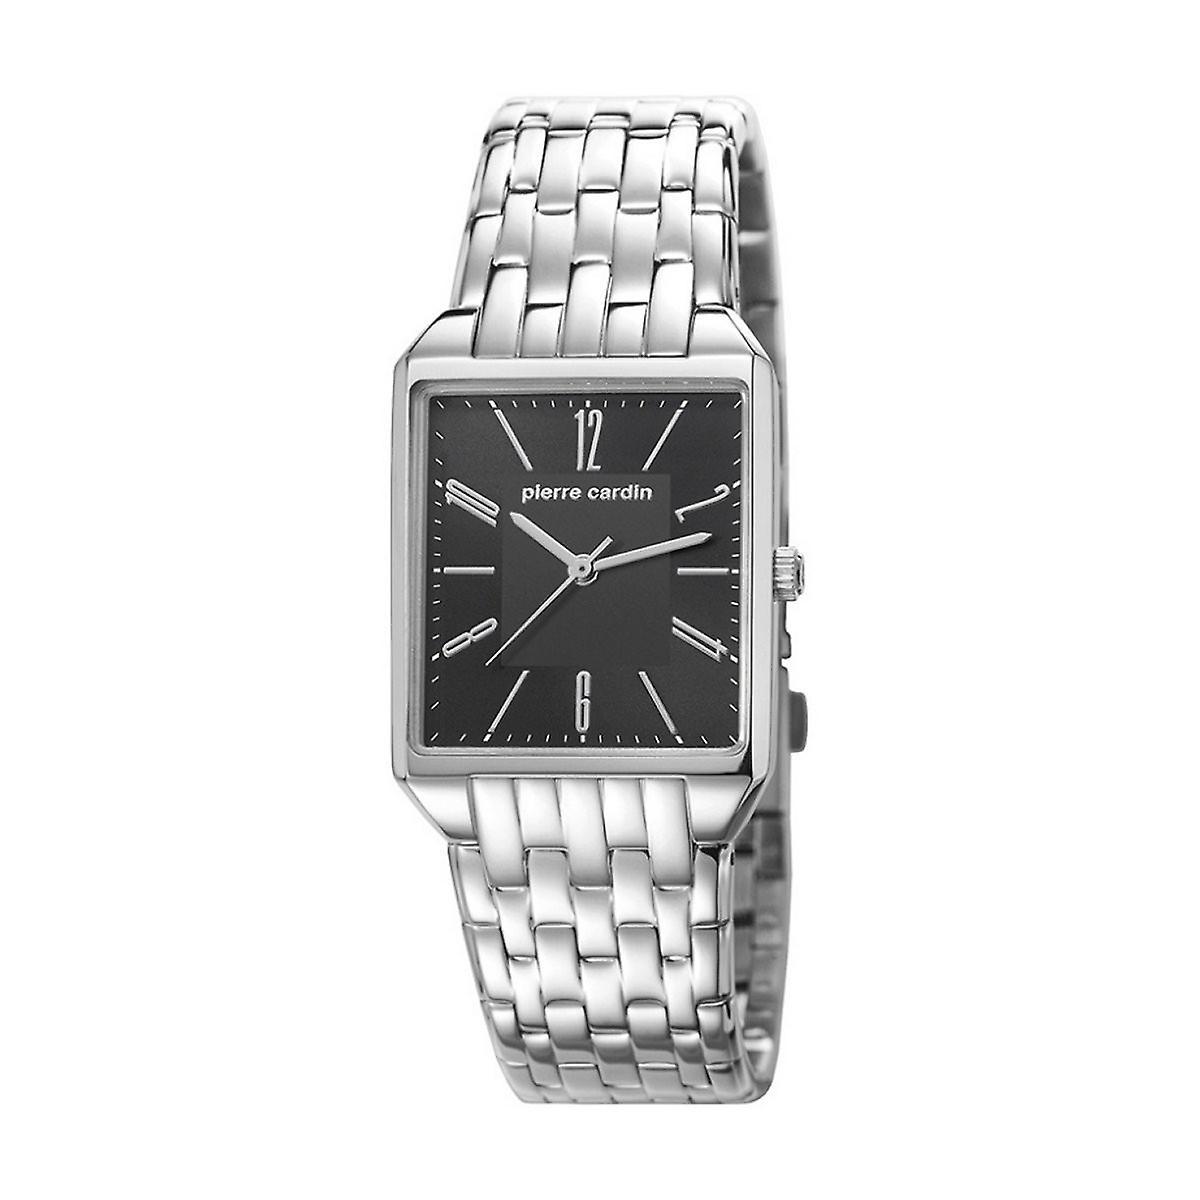 Pierre Cardin Damen Unisex Uhr Armbanduhr CHEMIN NEUF Schwarz PC106691F06